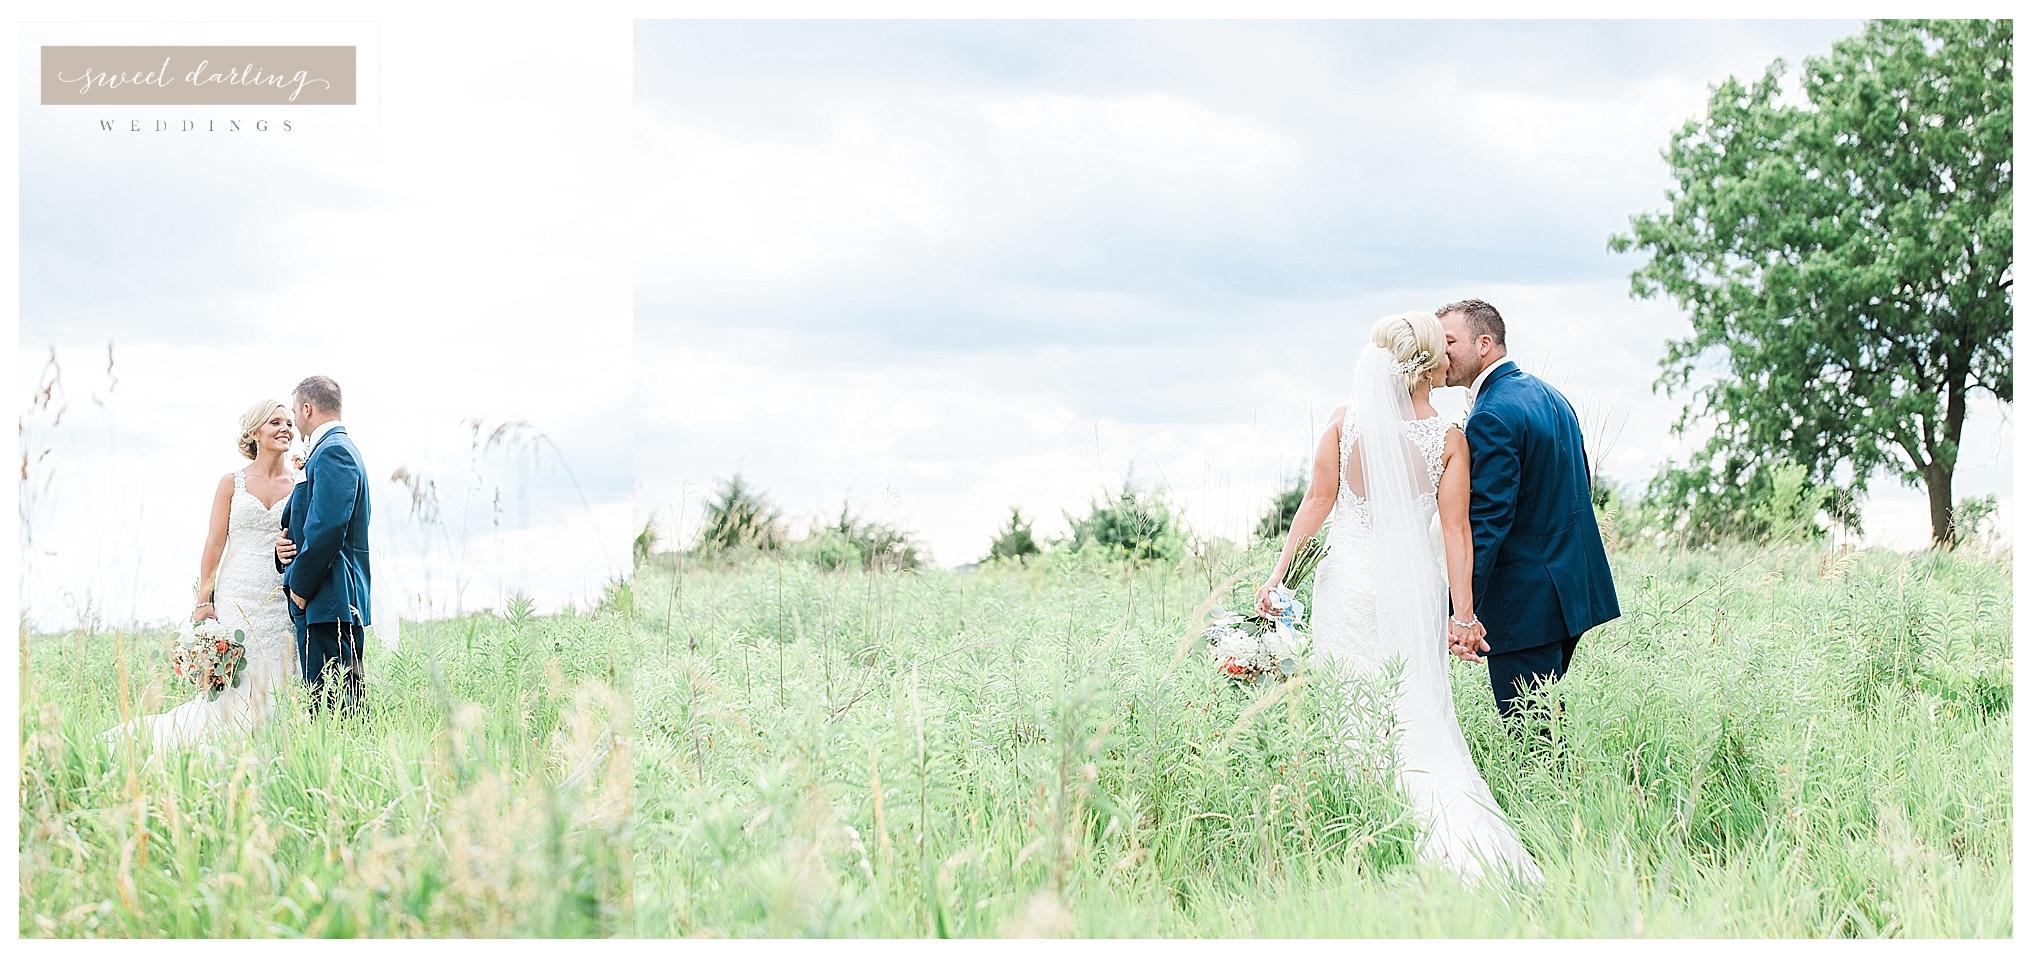 Paxton-illinois-engelbrecht-farmstead-romantic-wedding-photographer-sweet-darling-weddings_1242.jpg